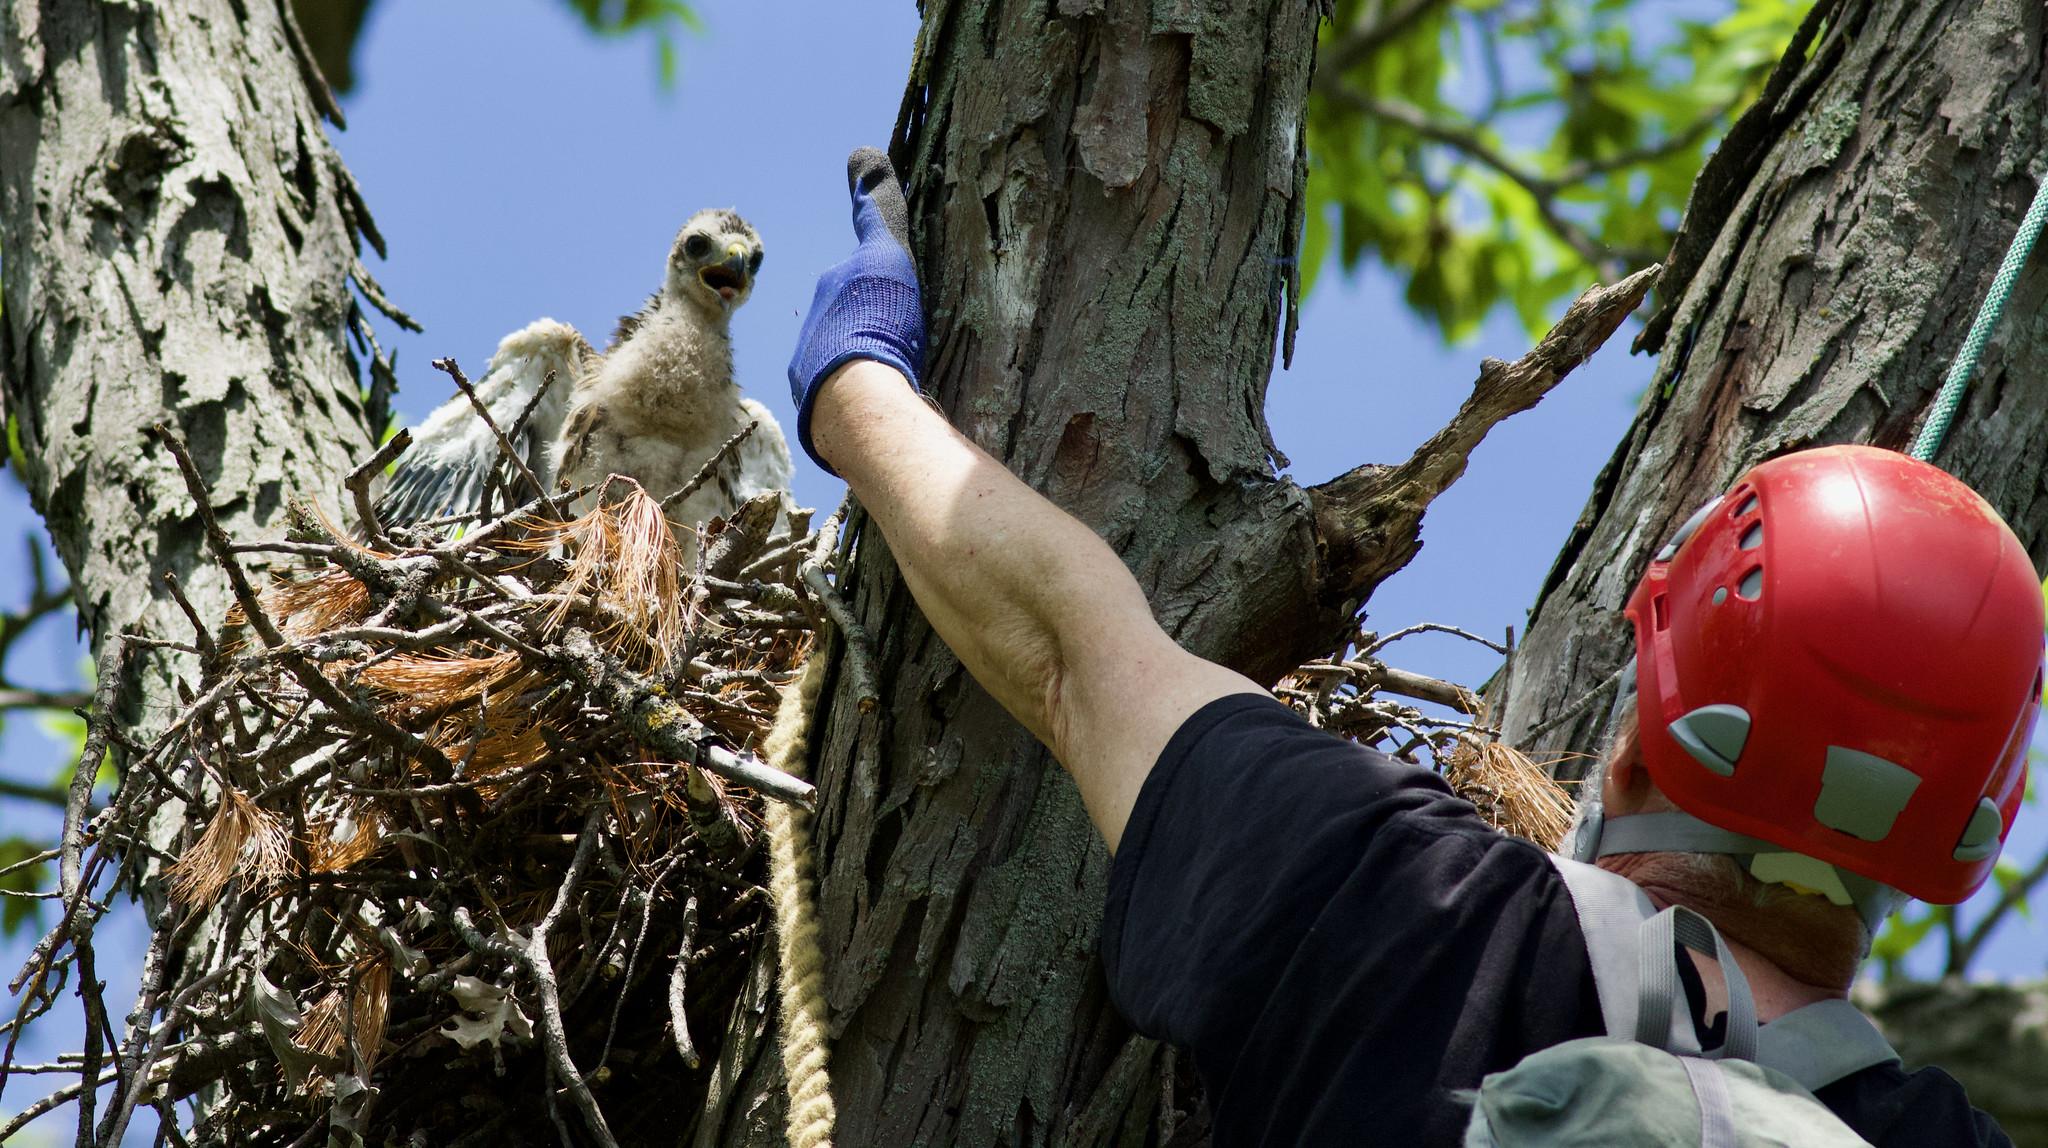 John approaching the nest. Photo by Arlene Koziol